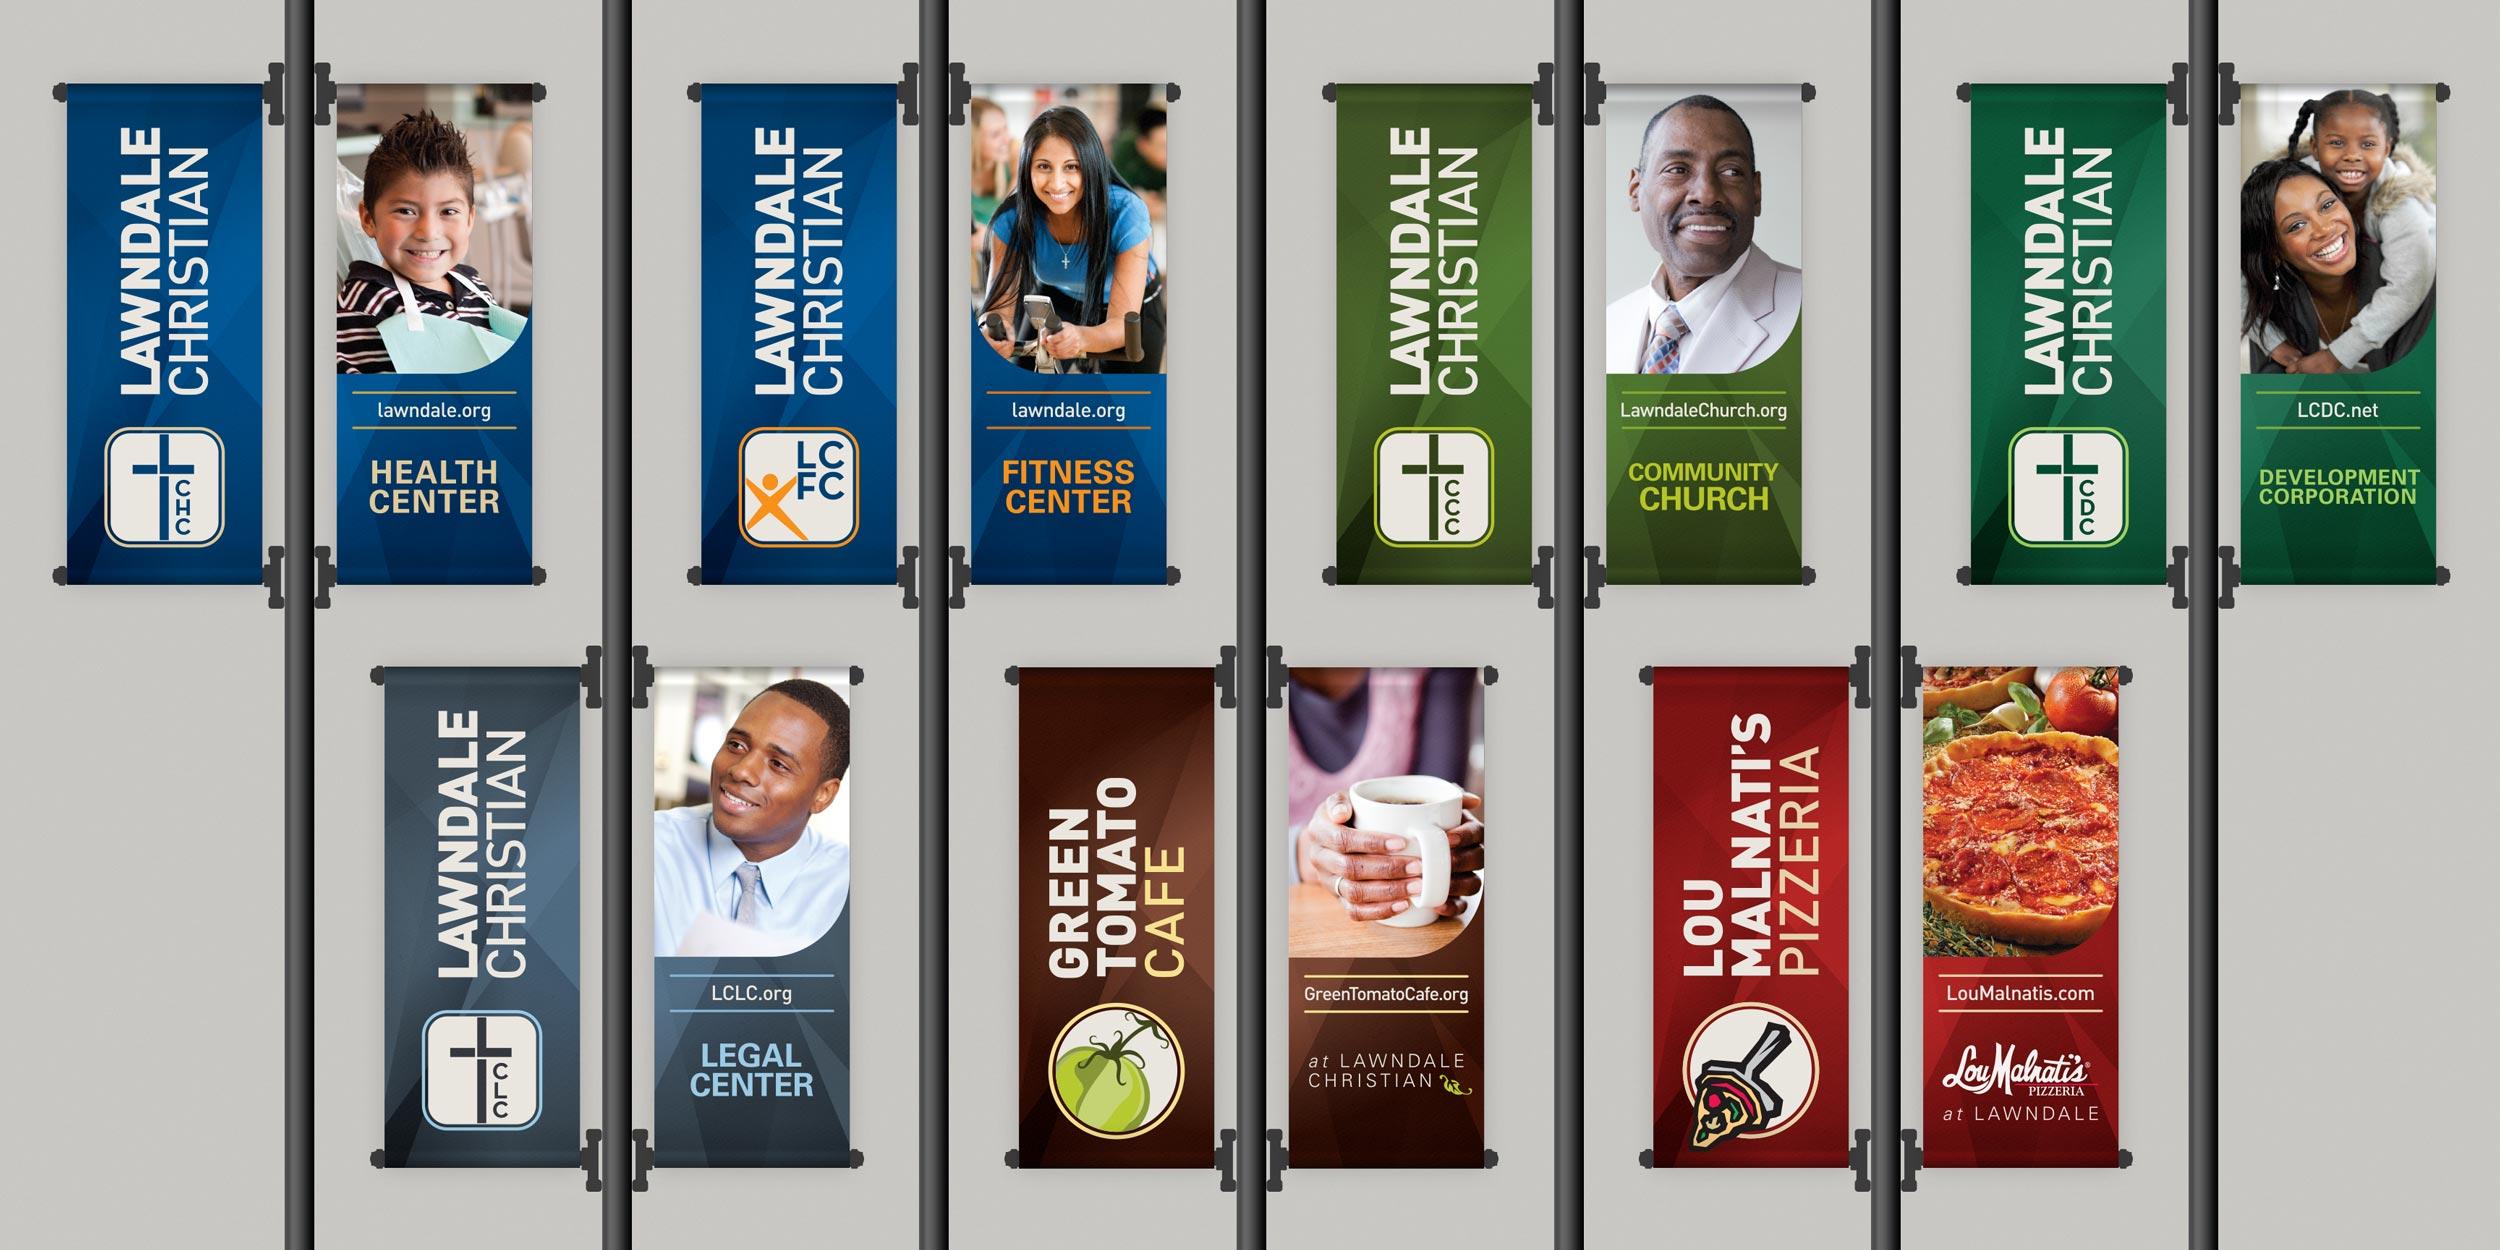 Lawndale Christian street banner designs.Image copyright Jeff Miller, HellothisisJeff Design LLC